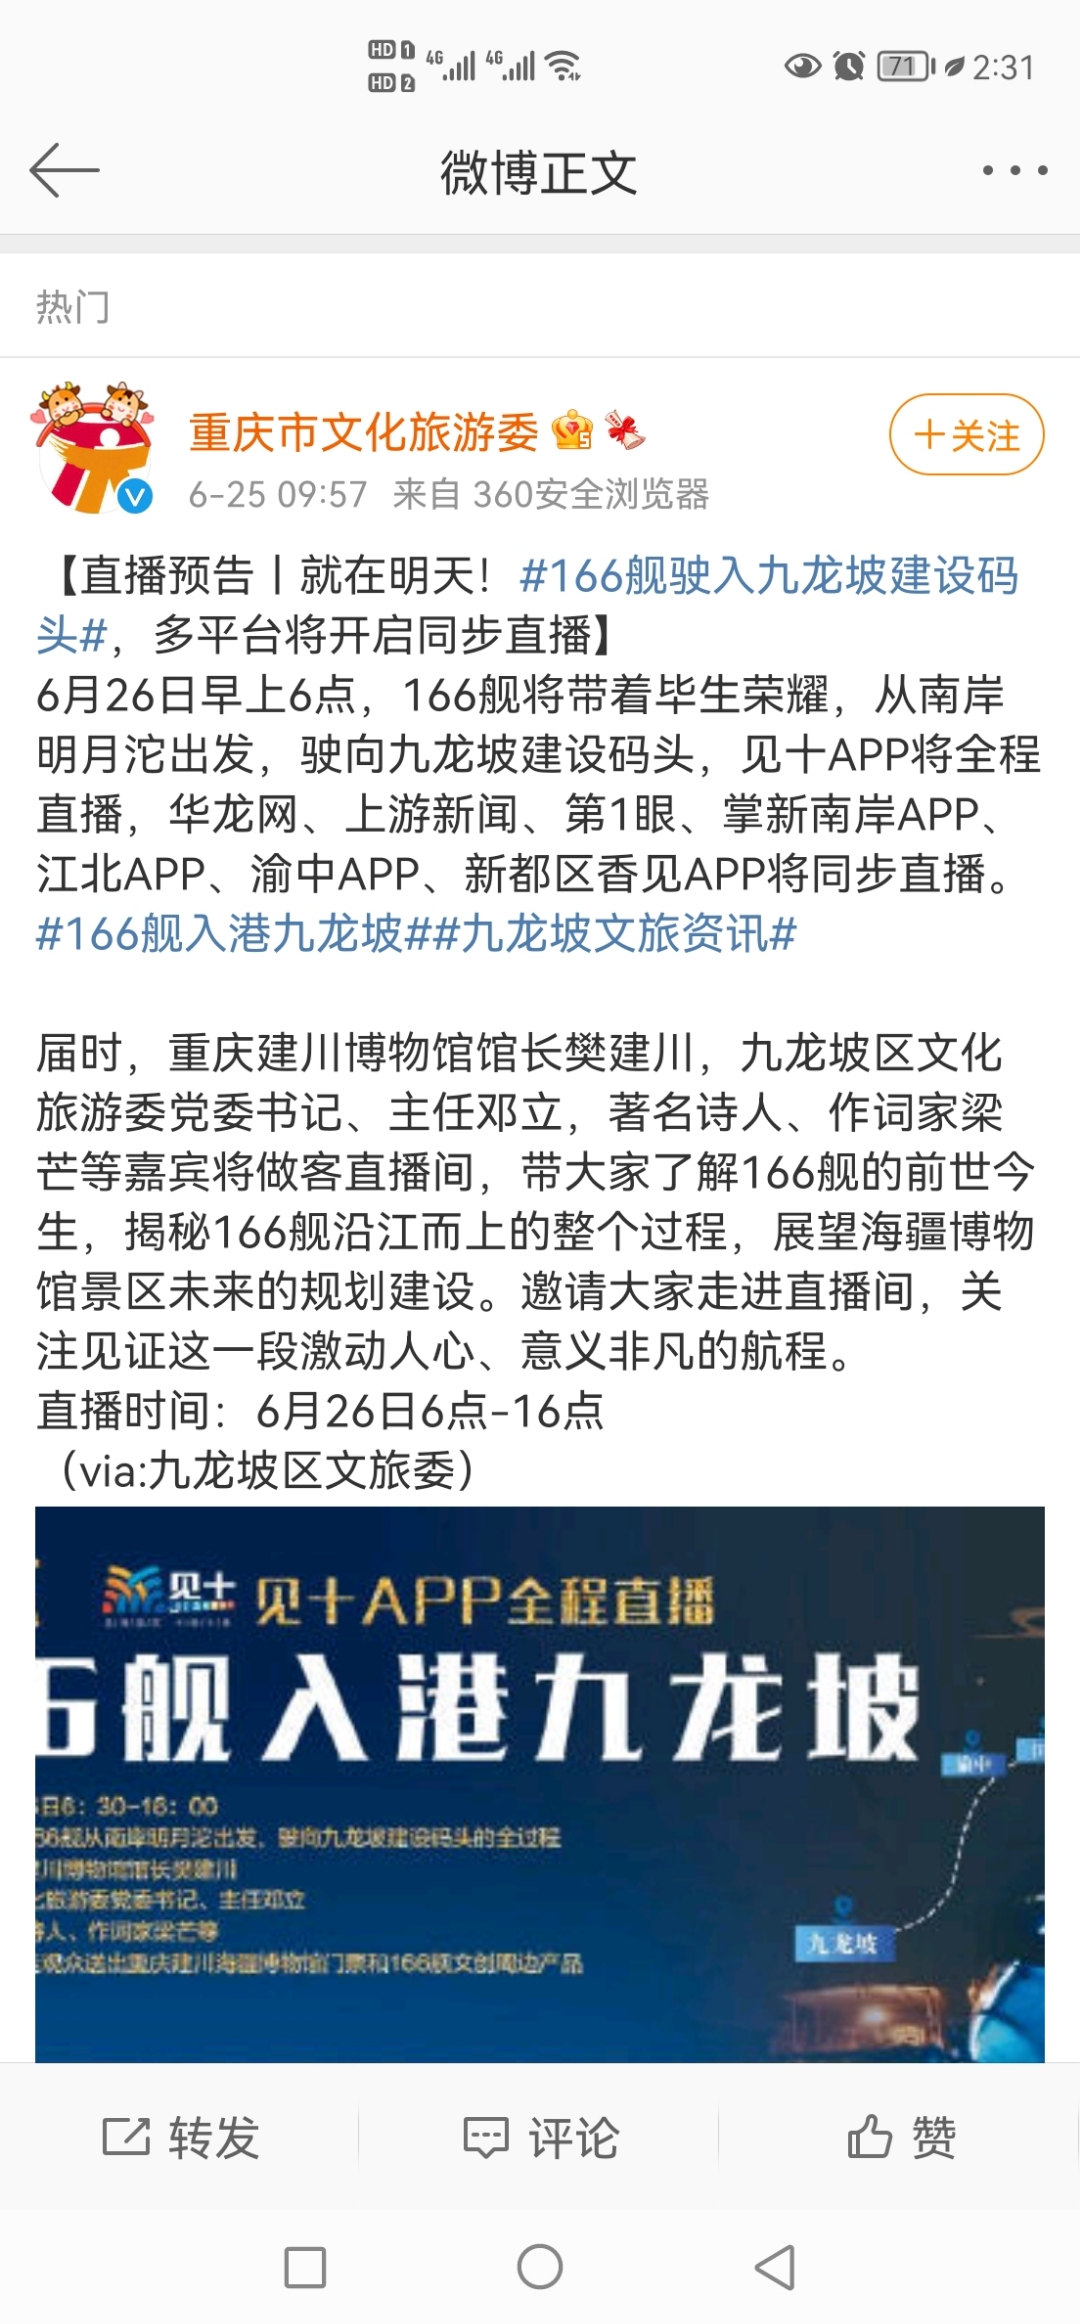 Screenshot_20210626_143106_com.sina.weibo.jpg